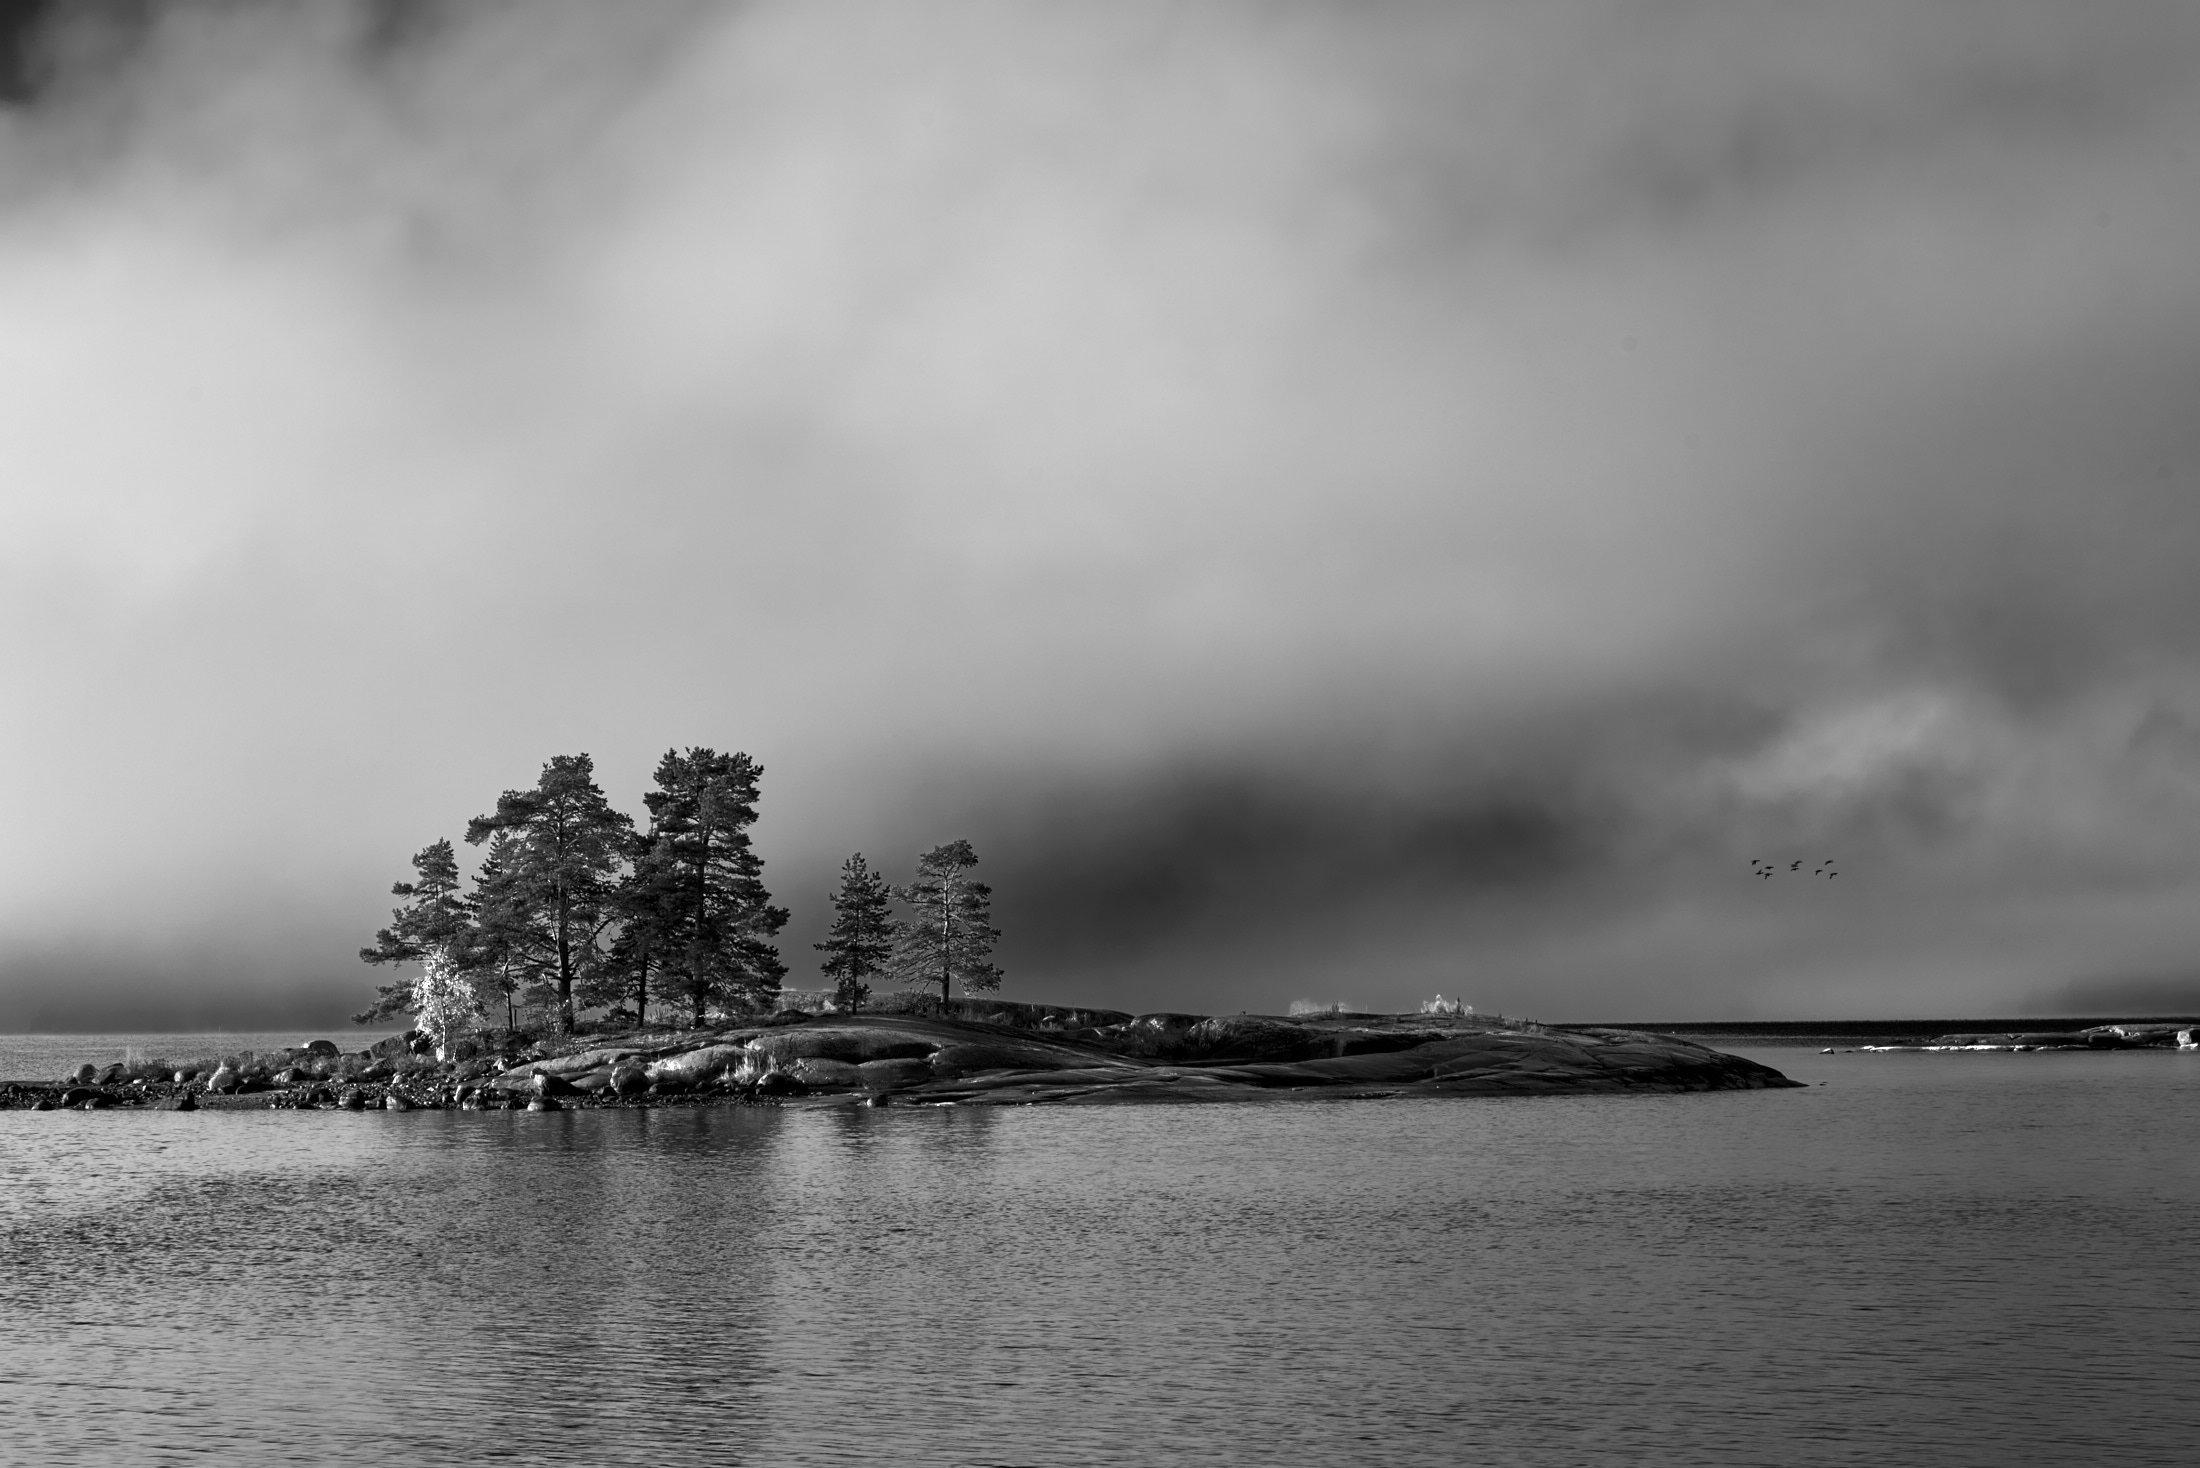 Island without Name, Study I